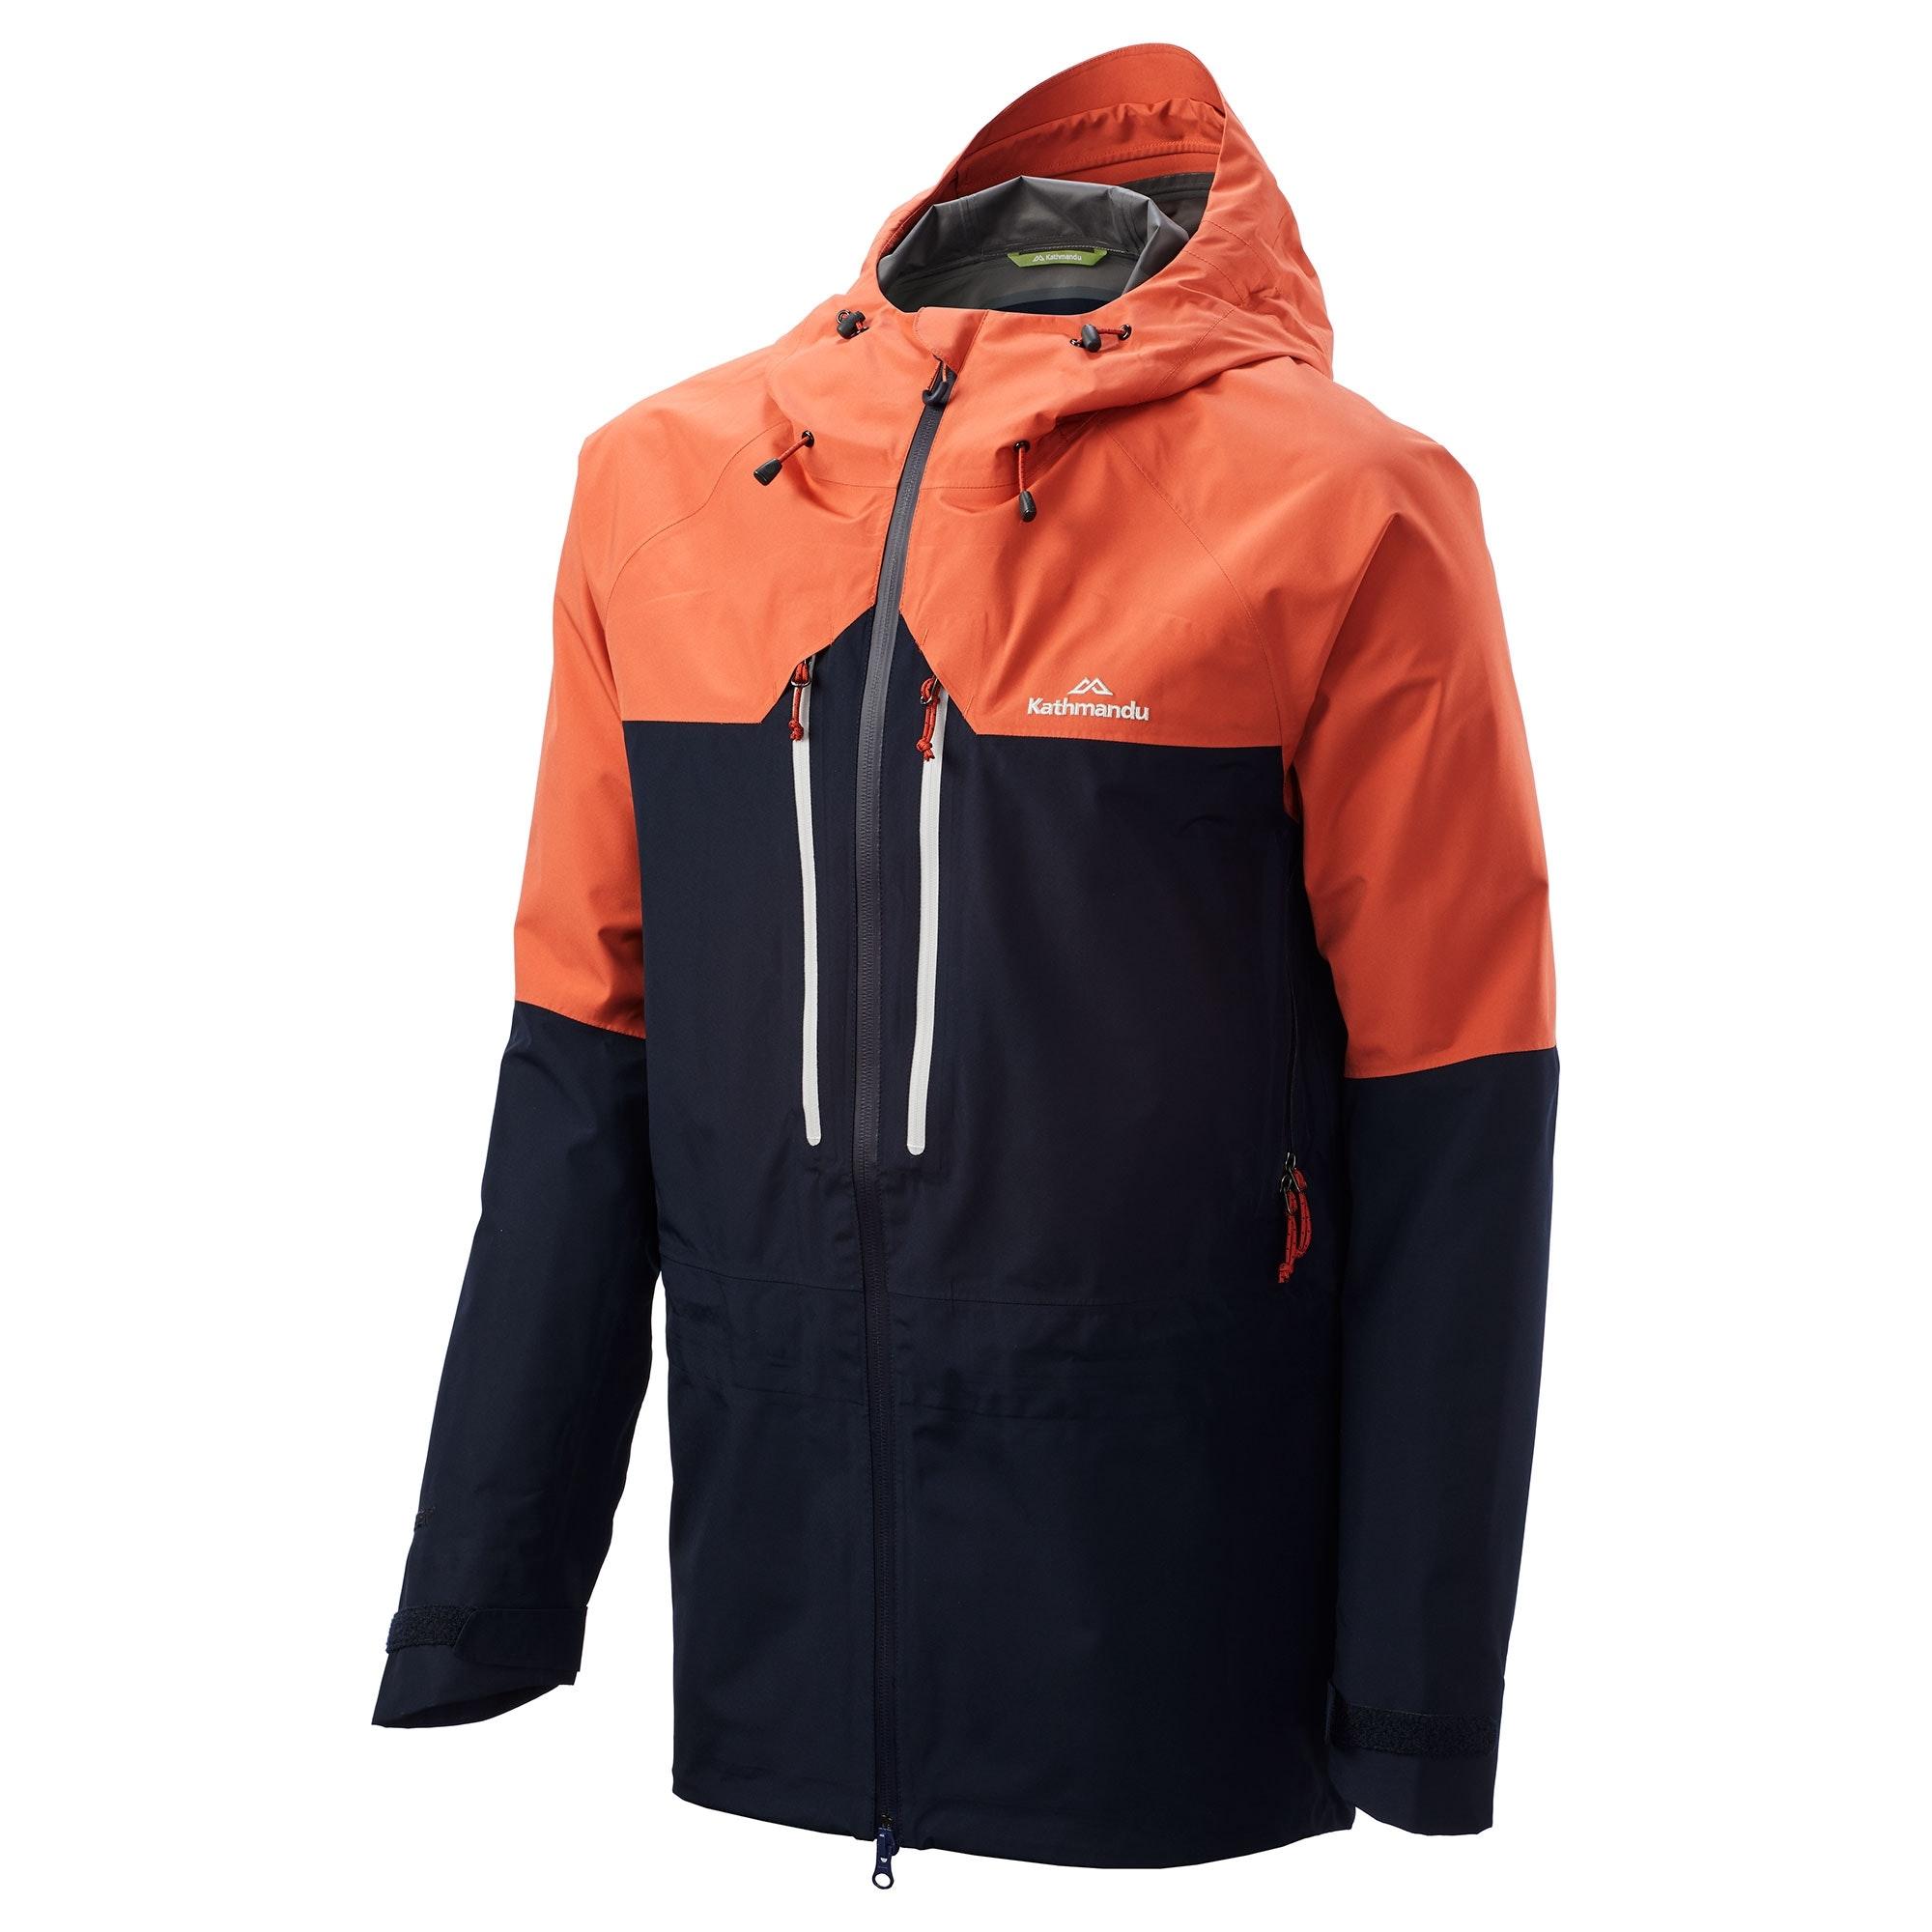 NEW-Kathmandu-Aysen-Men-039-s-GORE-TEX-Windproof-Waterproof-Outdoor-Rain-Jacket thumbnail 12